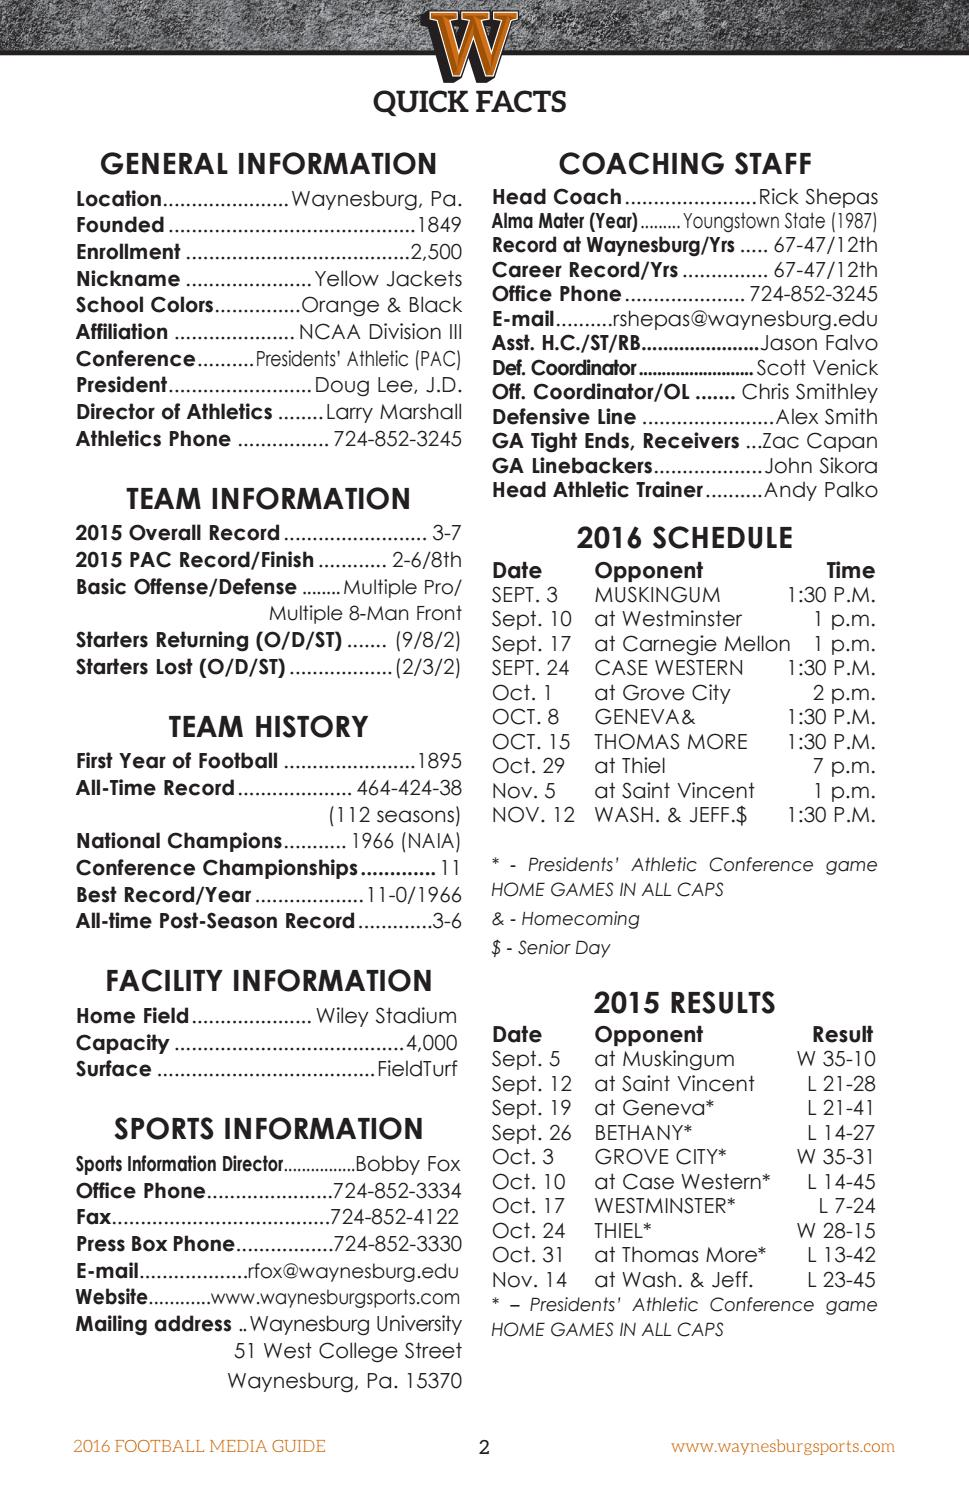 2016 Waynesburg Football Guide by Waynesburg University - issuu